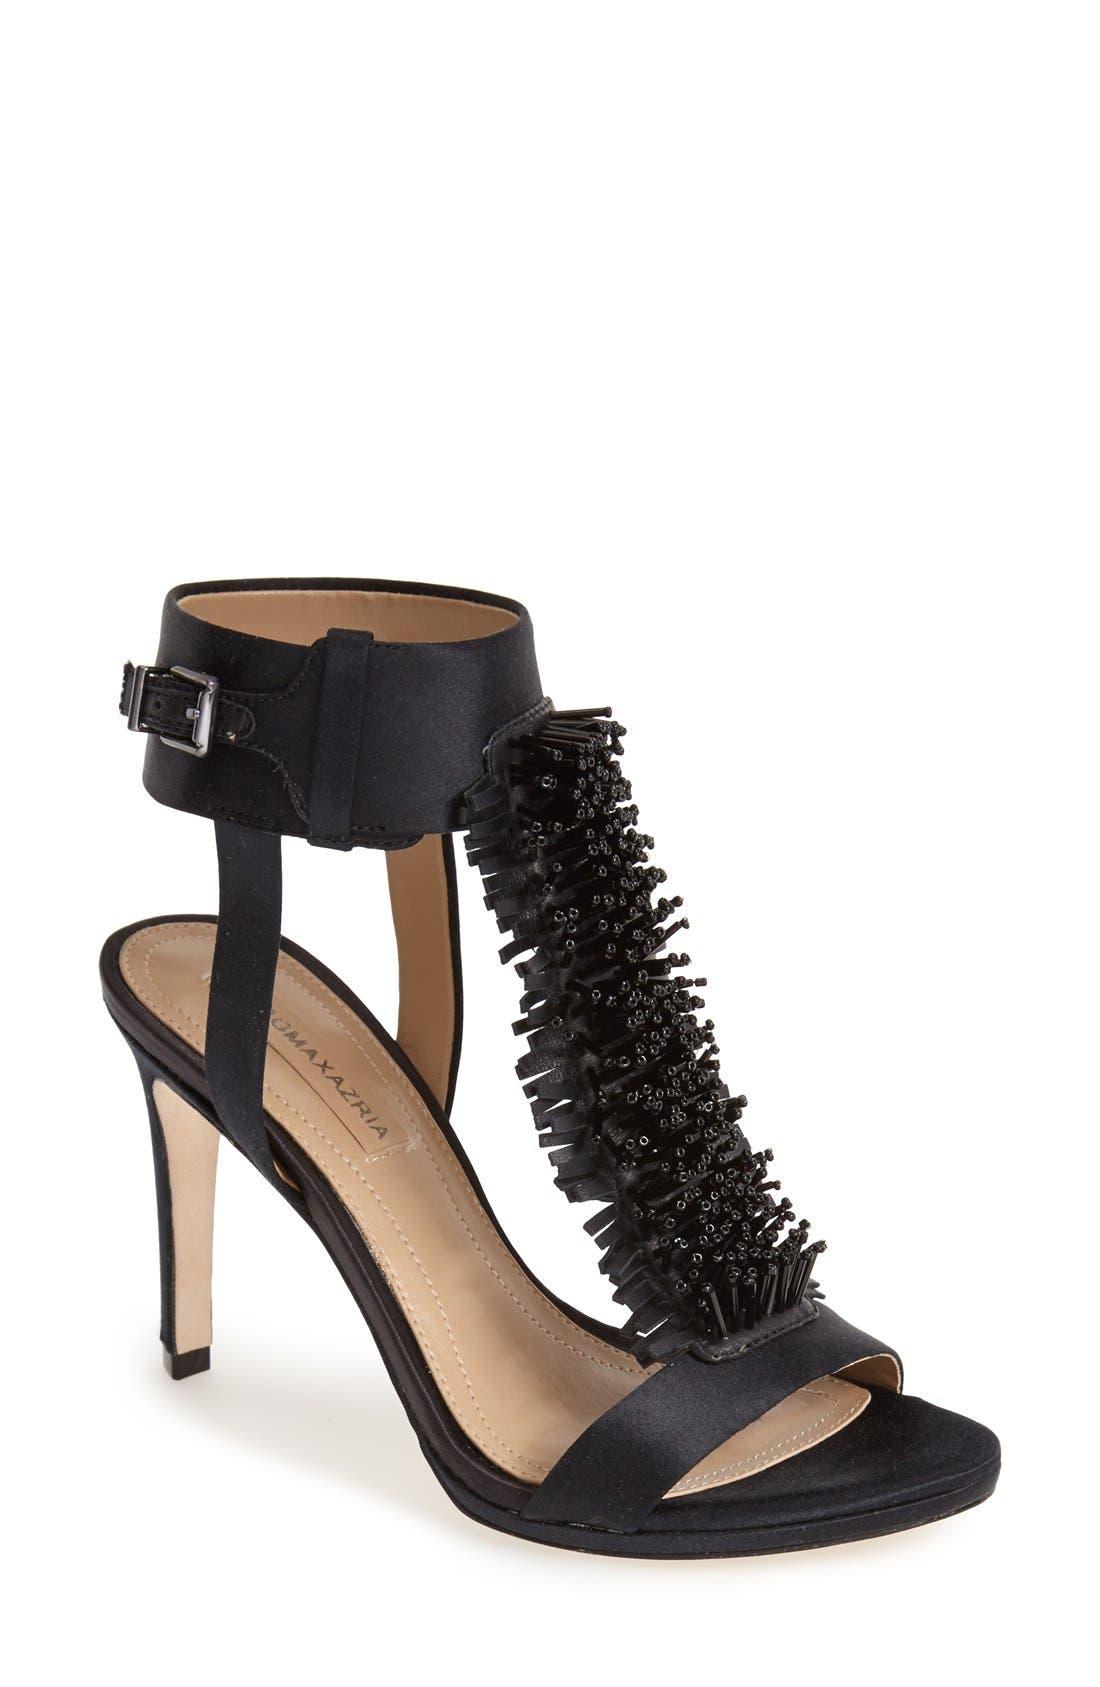 Main Image - BCBGMAXAZRIA 'Ma-Limbo' Fringe T-Strap Satin Sandal (Women)